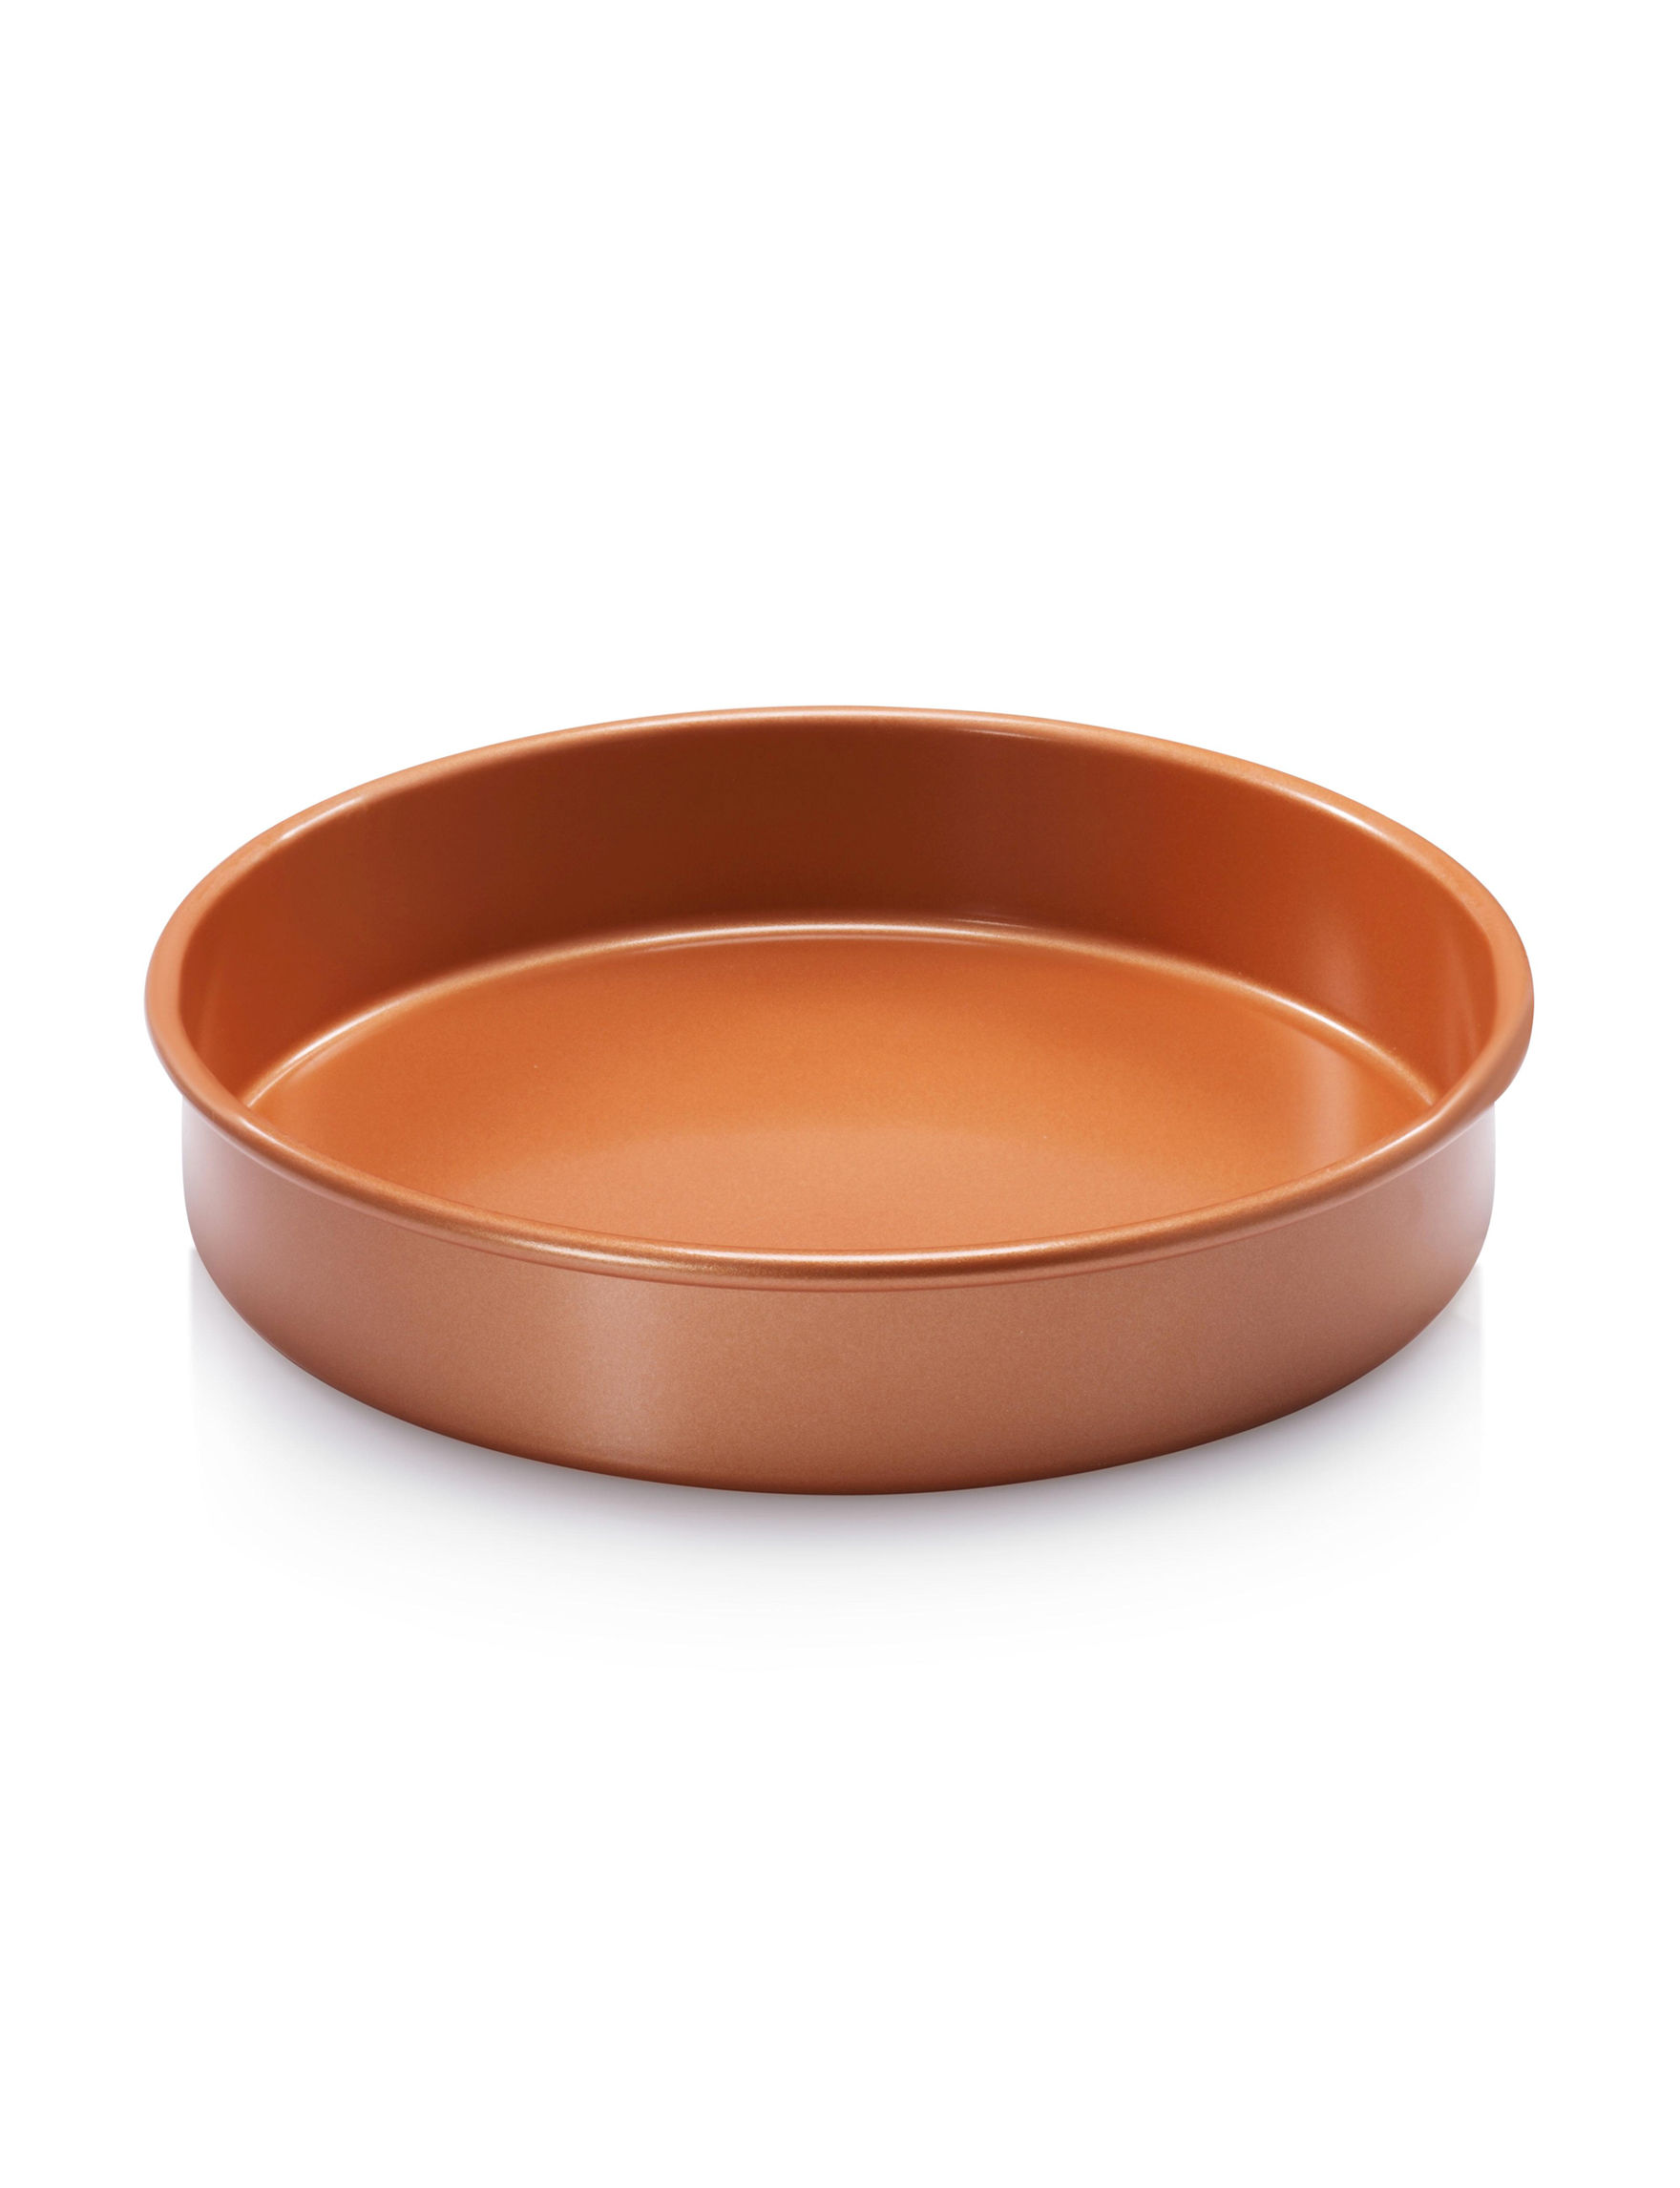 Gotham Steel Copper Cake Pans Bakeware